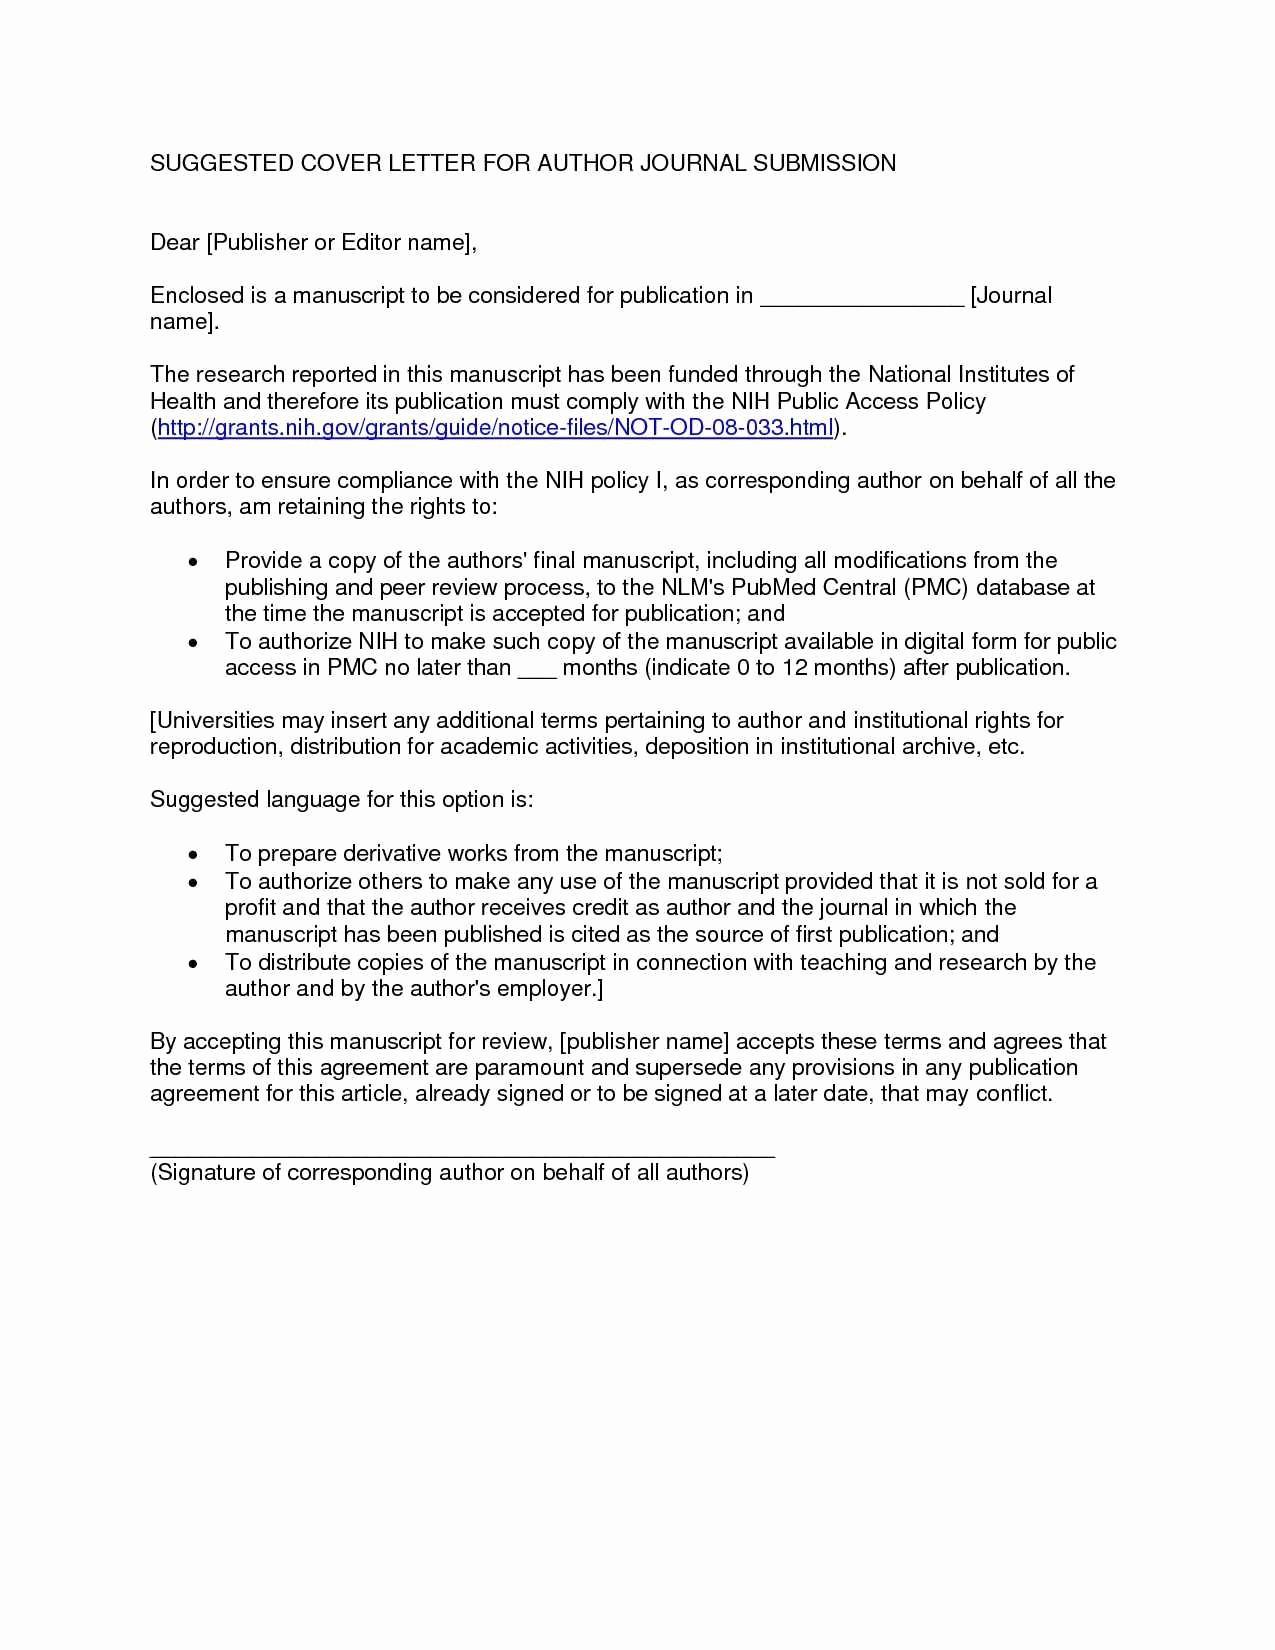 Cv Qa Engineer Example Einzigartig Cover Letters Lara Expolicenciaslatam Of 30 Grossartig